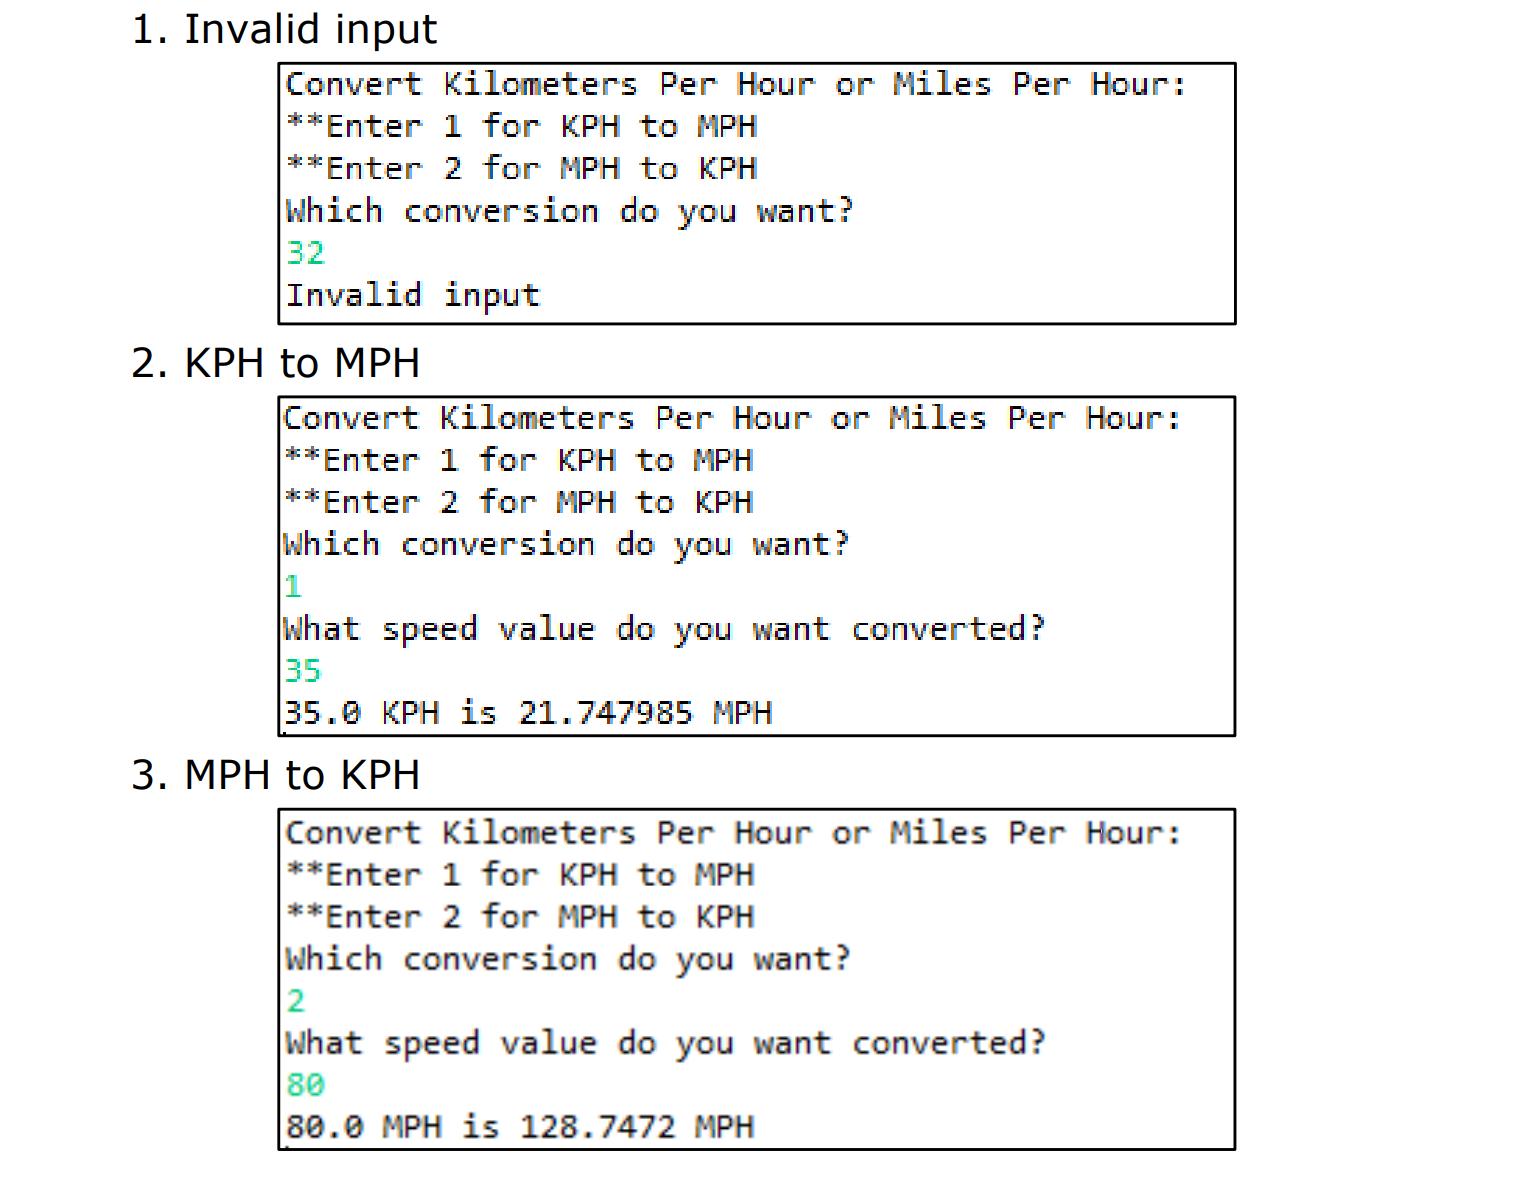 Kilometers To Mph >> Answered 1 Invalid Inputconvert Kilometers Per Bartleby